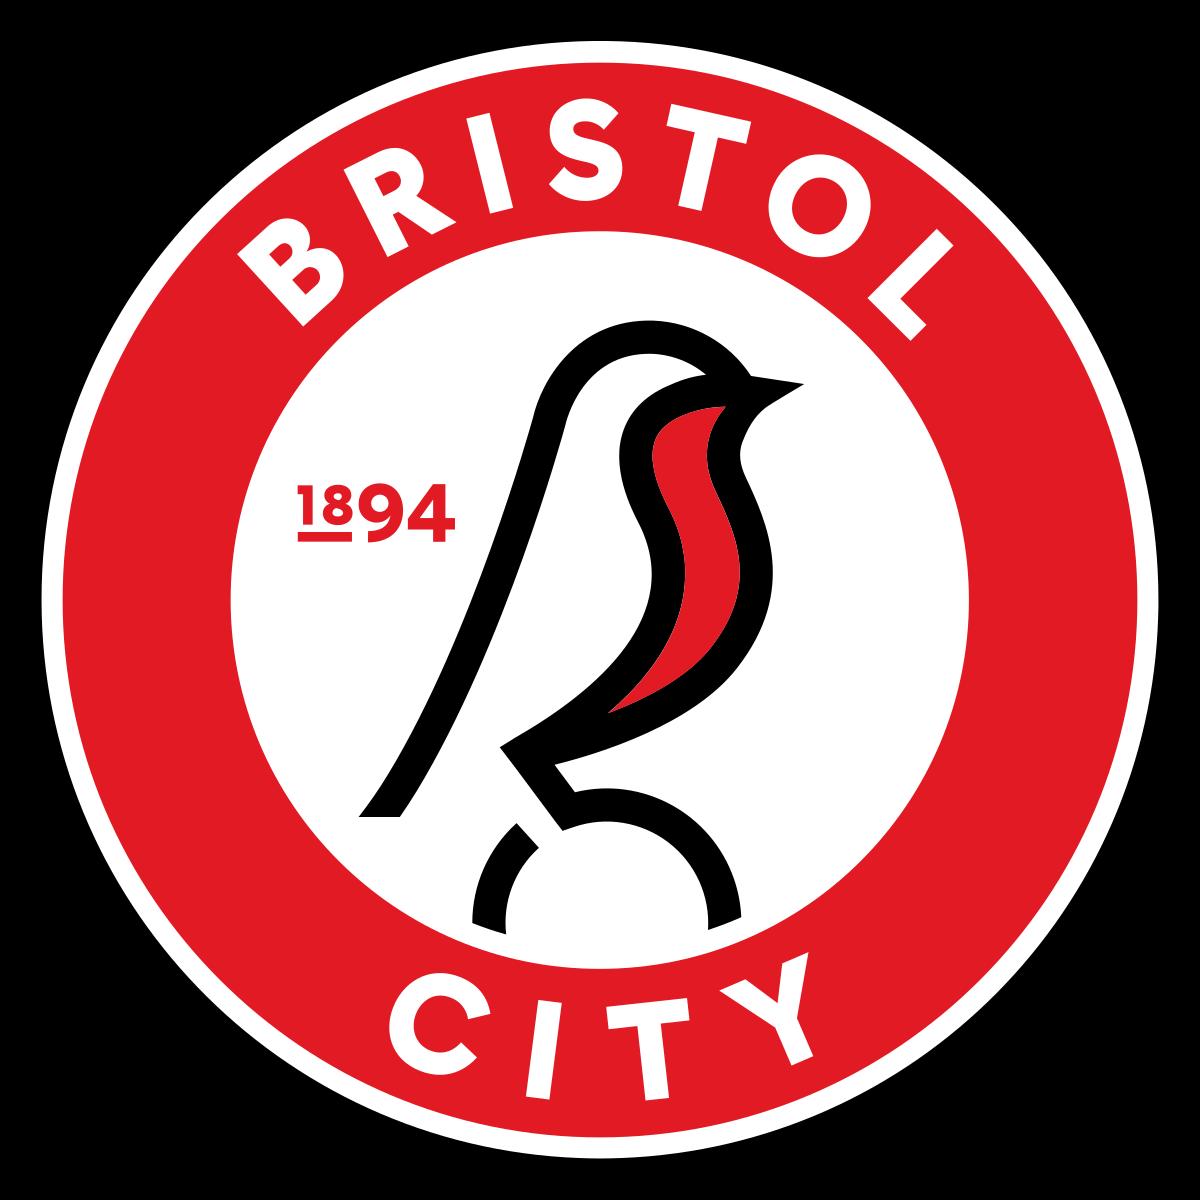 Bristol City W